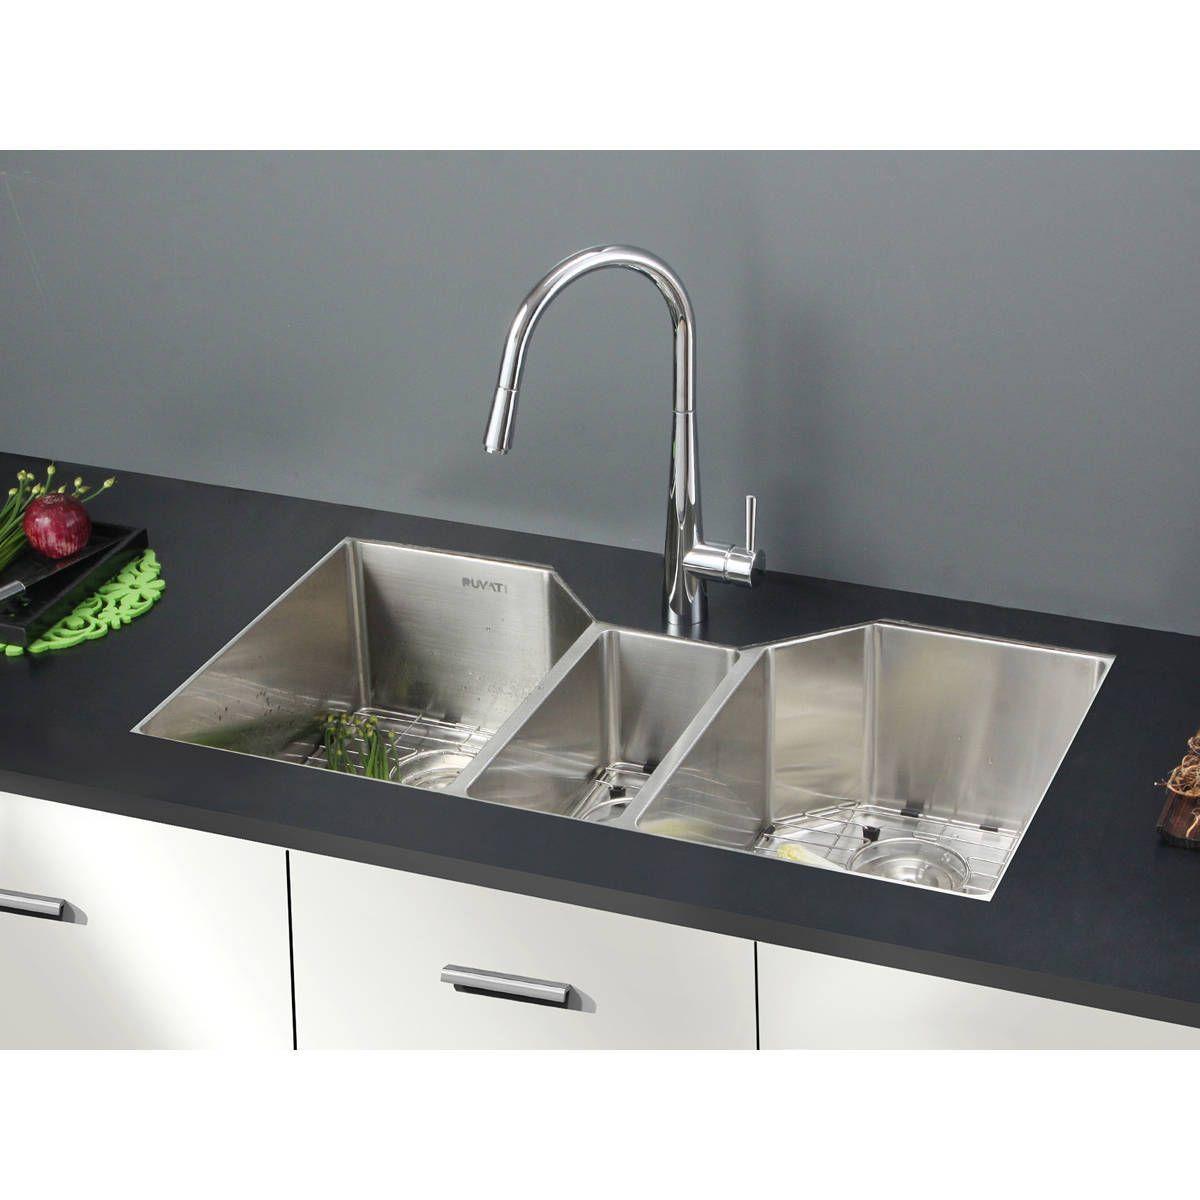 Triple Sink Kitchen Cottage Style Chairs Ruvati 16 Gauge Stainless Steel 34 Inch Bowl Undermount Rvh8500 Silver Size Over 22